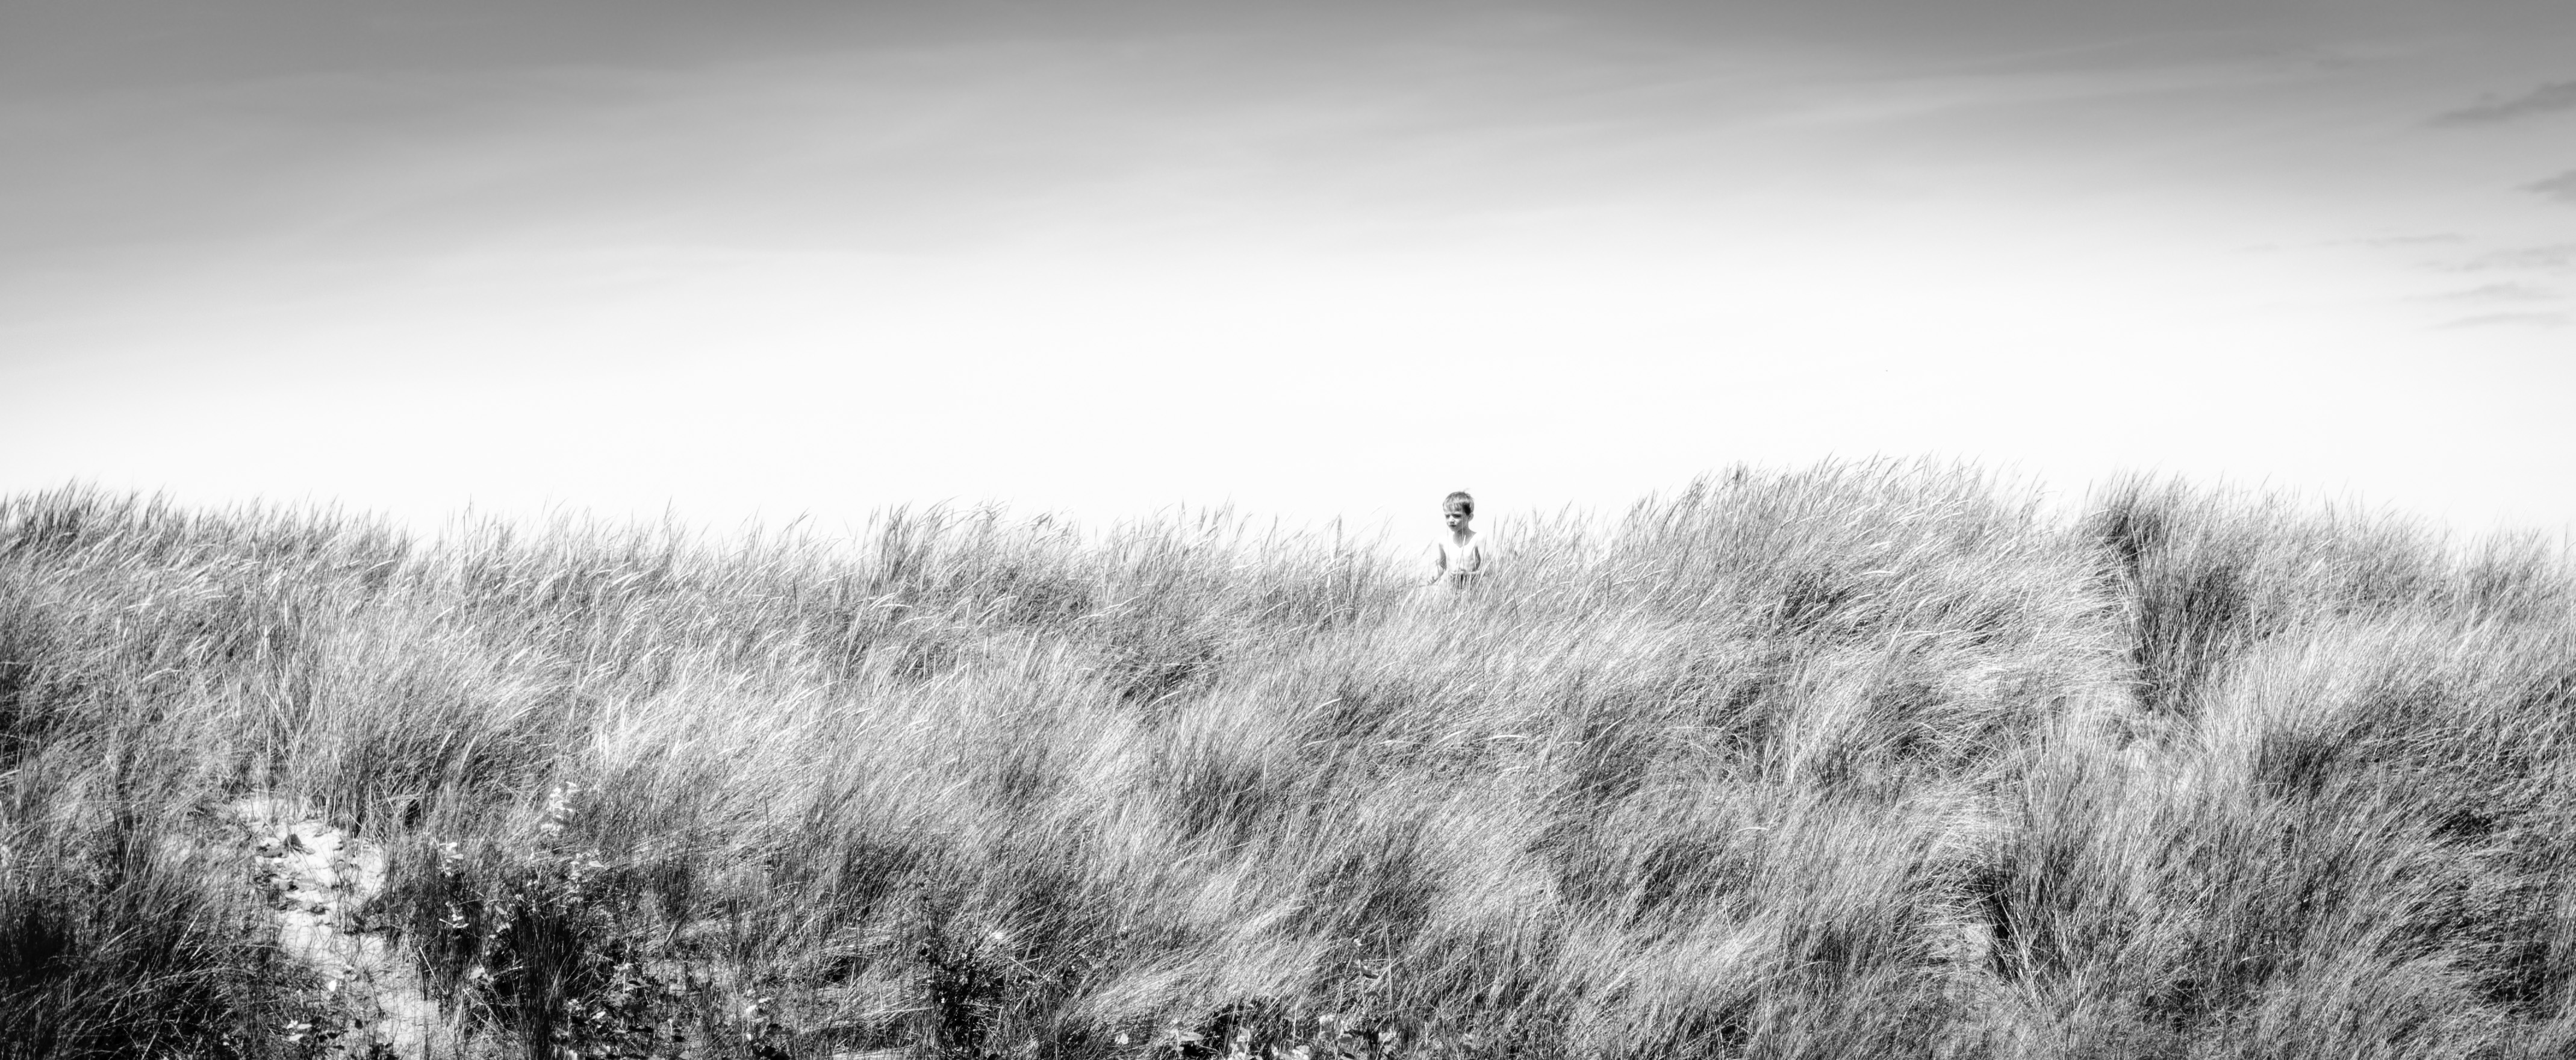 Dune 2013 Knokke